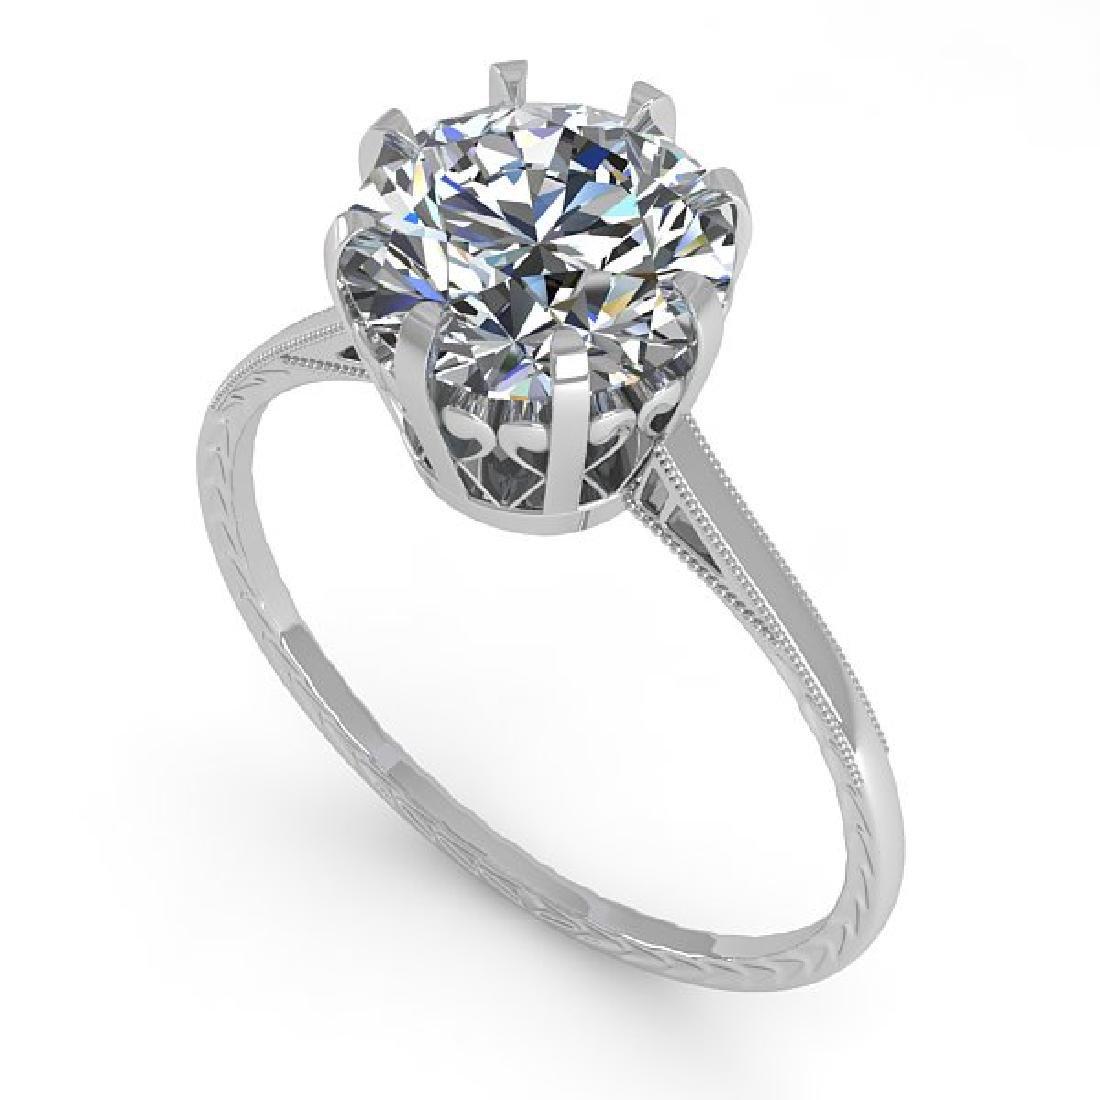 2 CTW VS/SI Diamond Solitaire Engagement Ring 14K White - 2